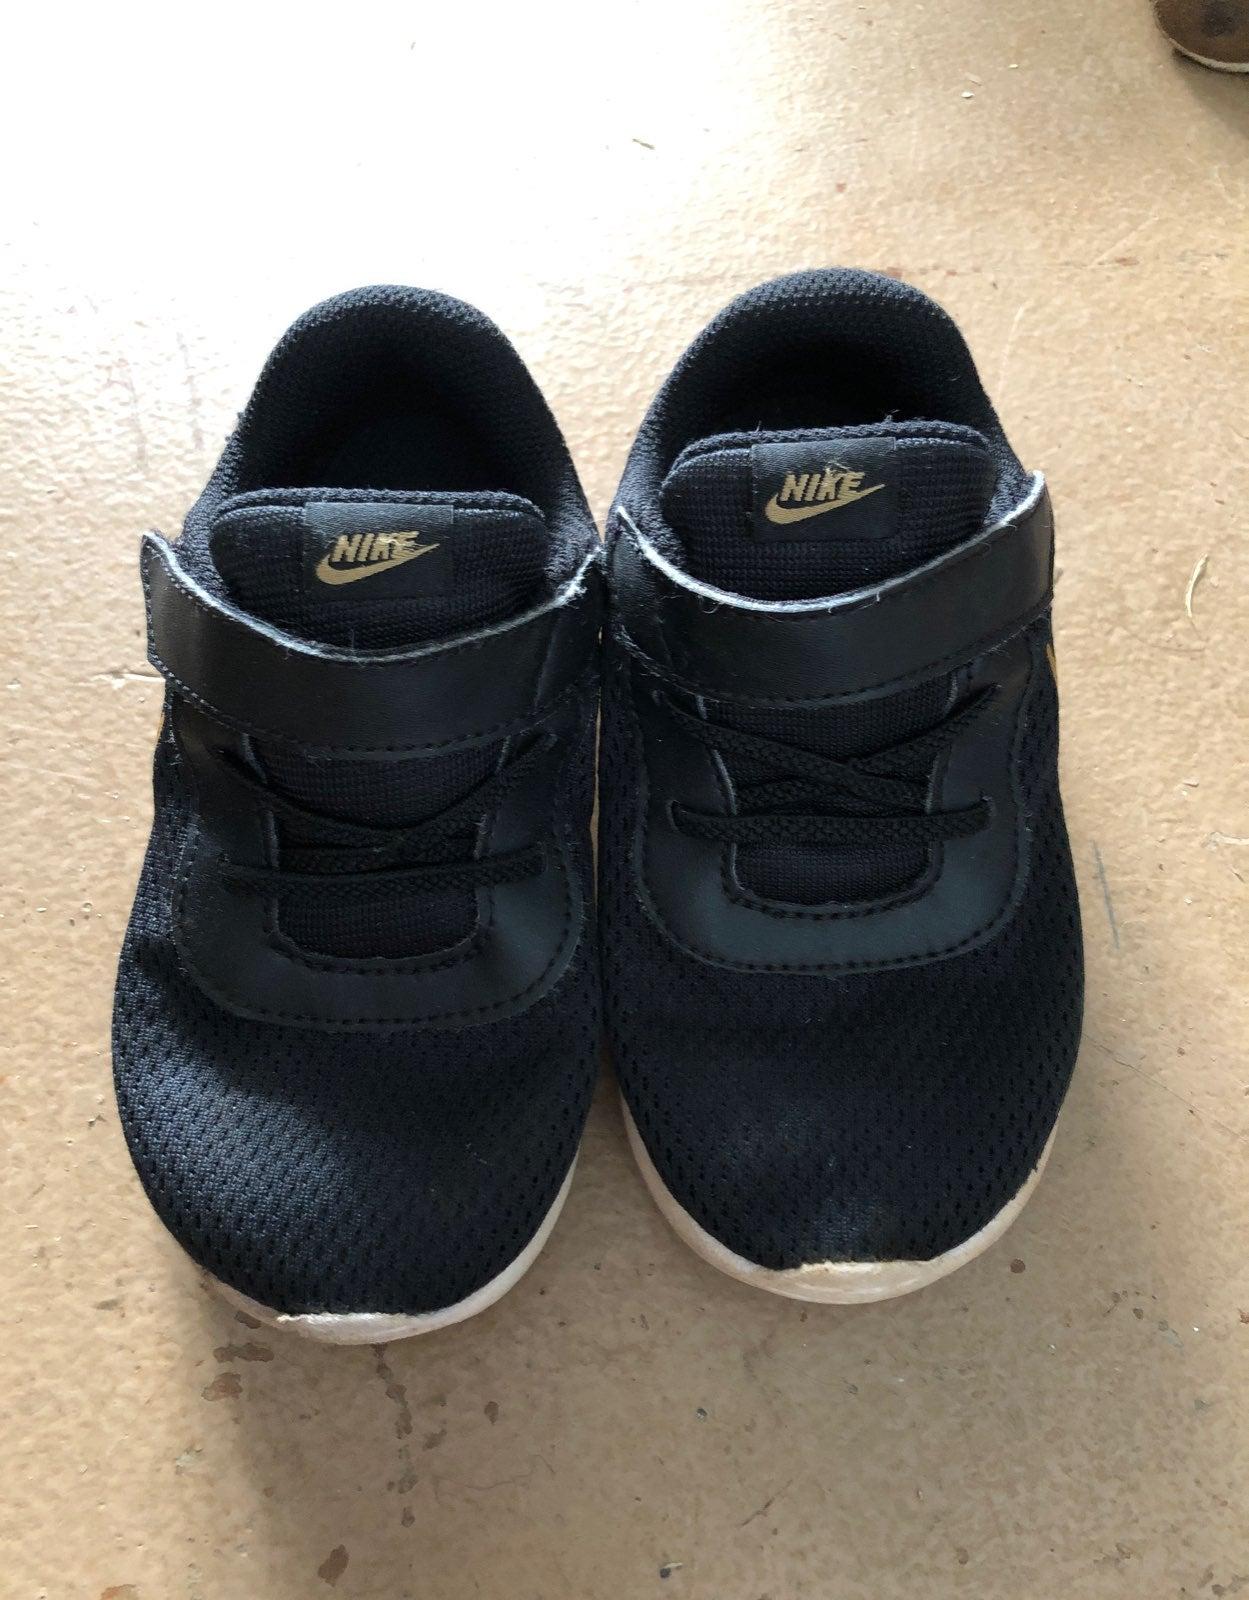 Boys toddler Nike size 8c